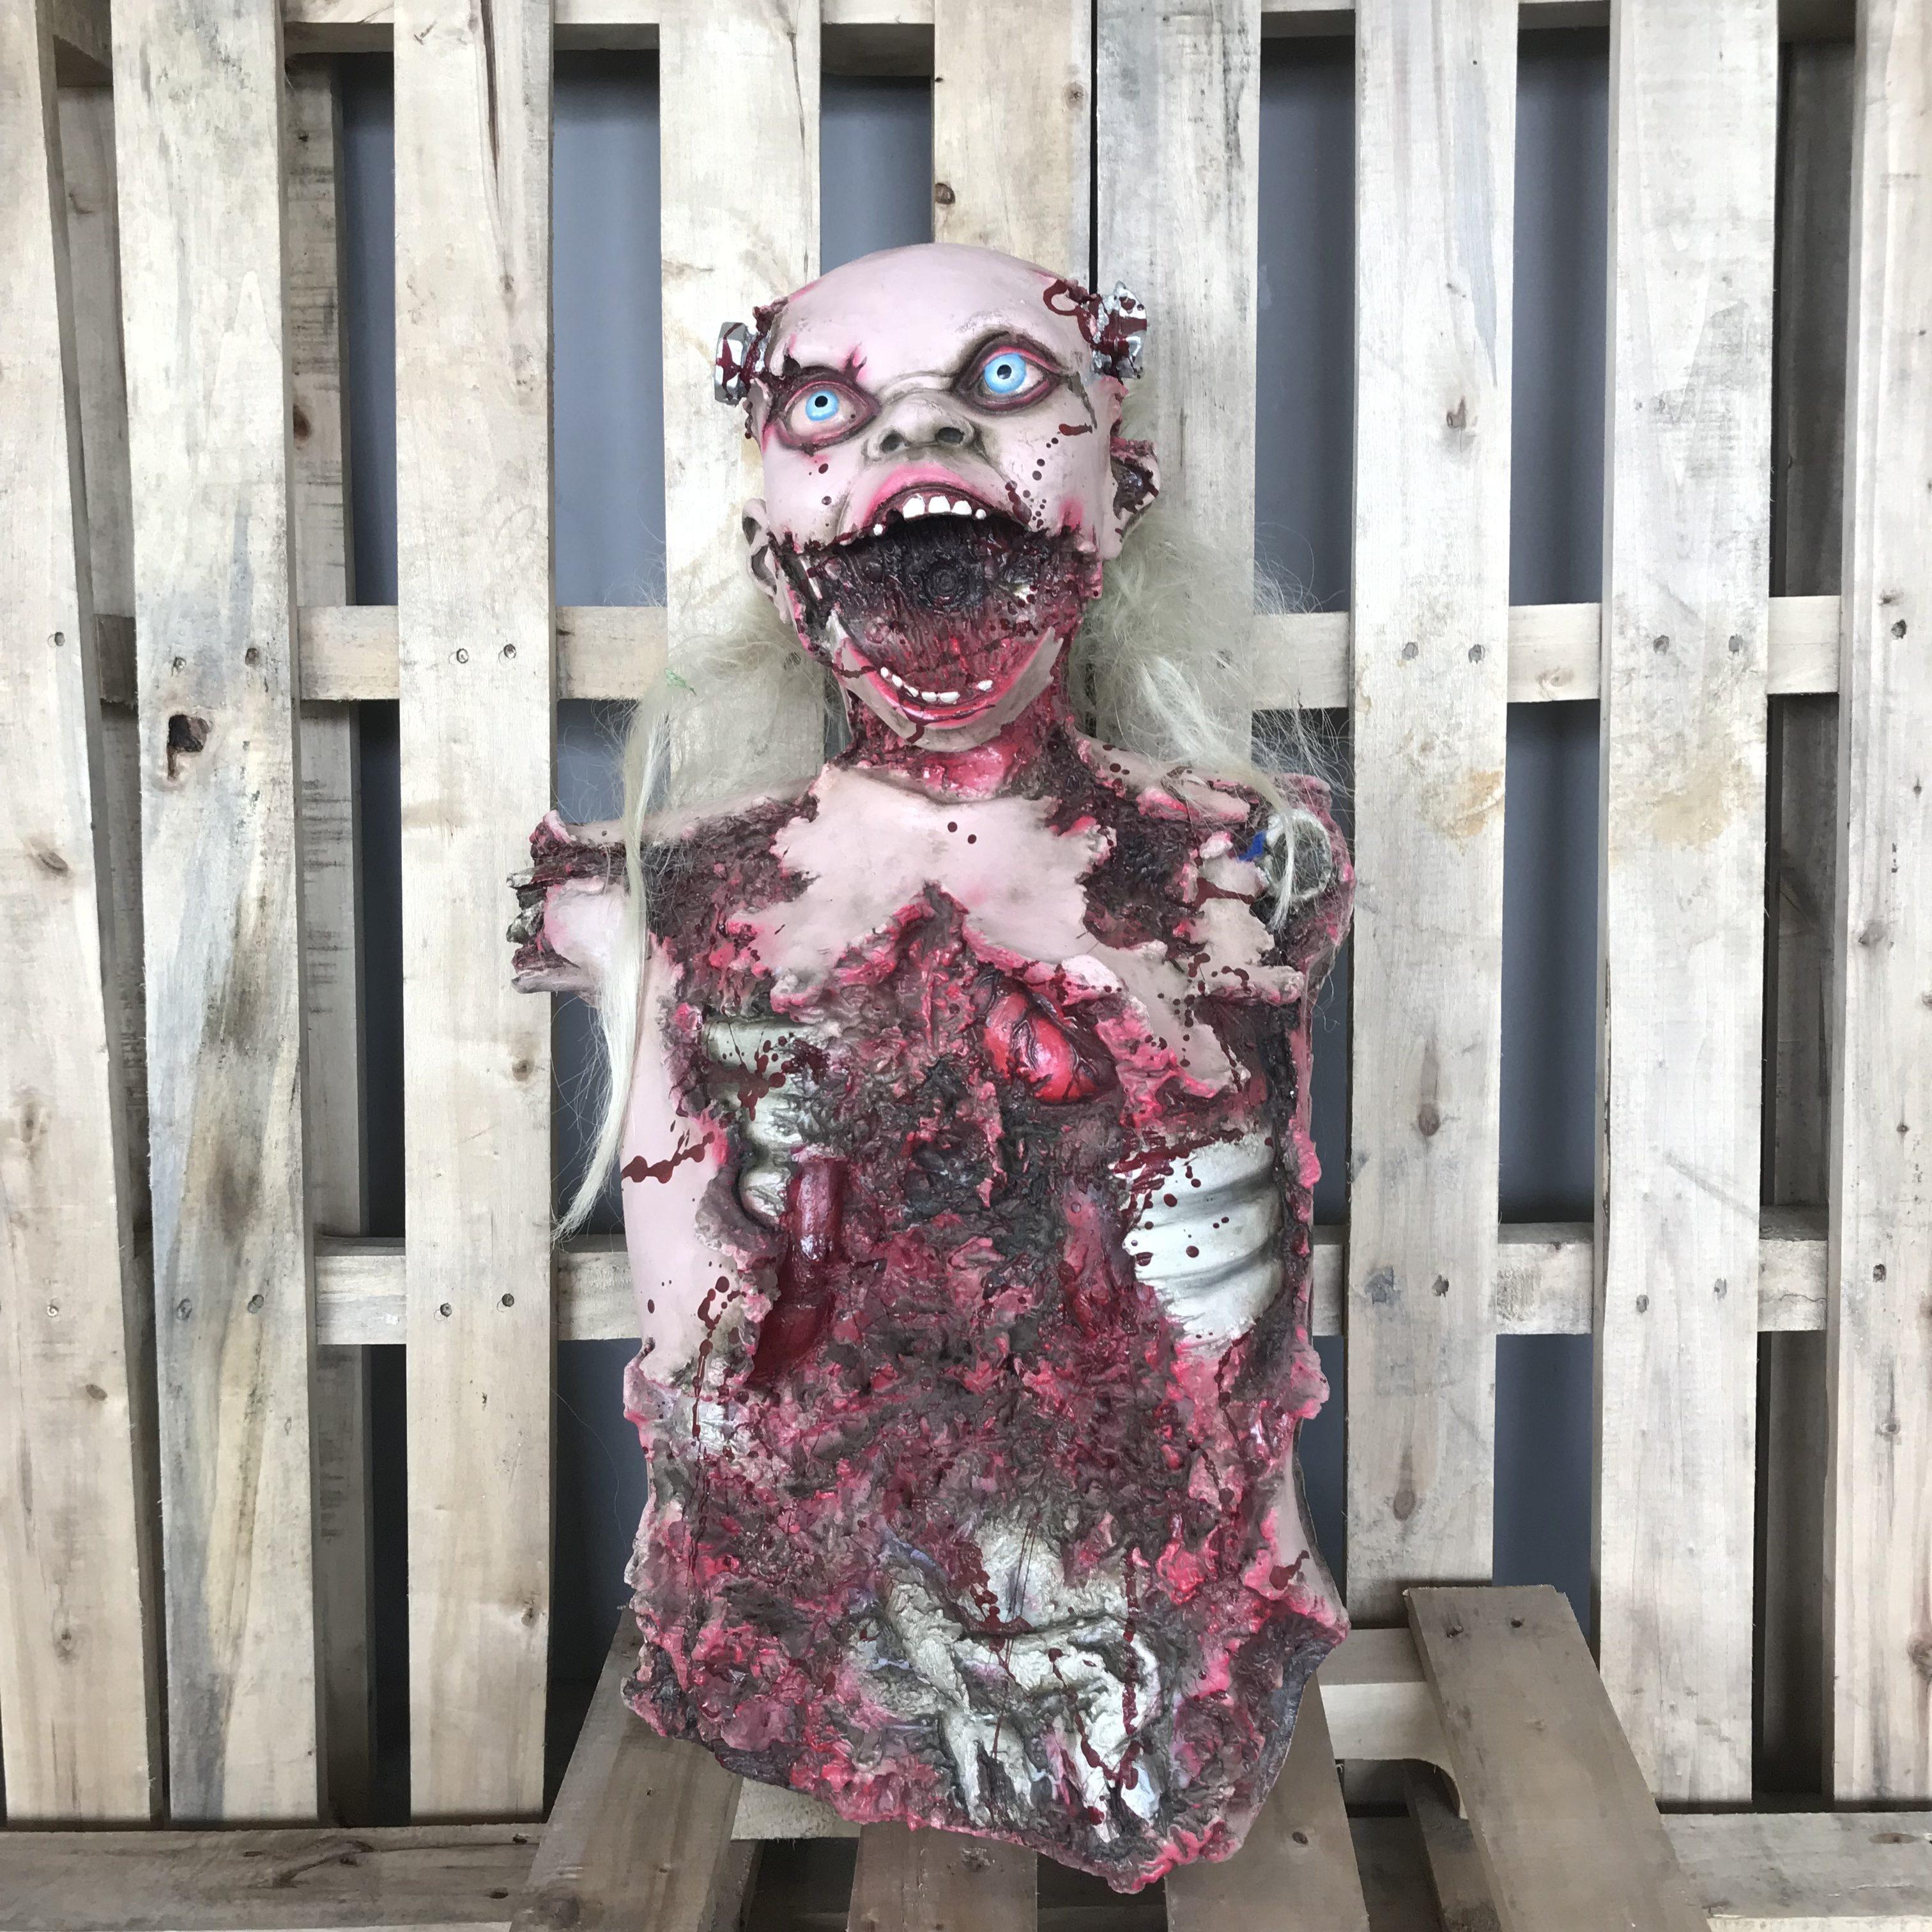 singapore-event-management-our-shop-props-rotting-corpse